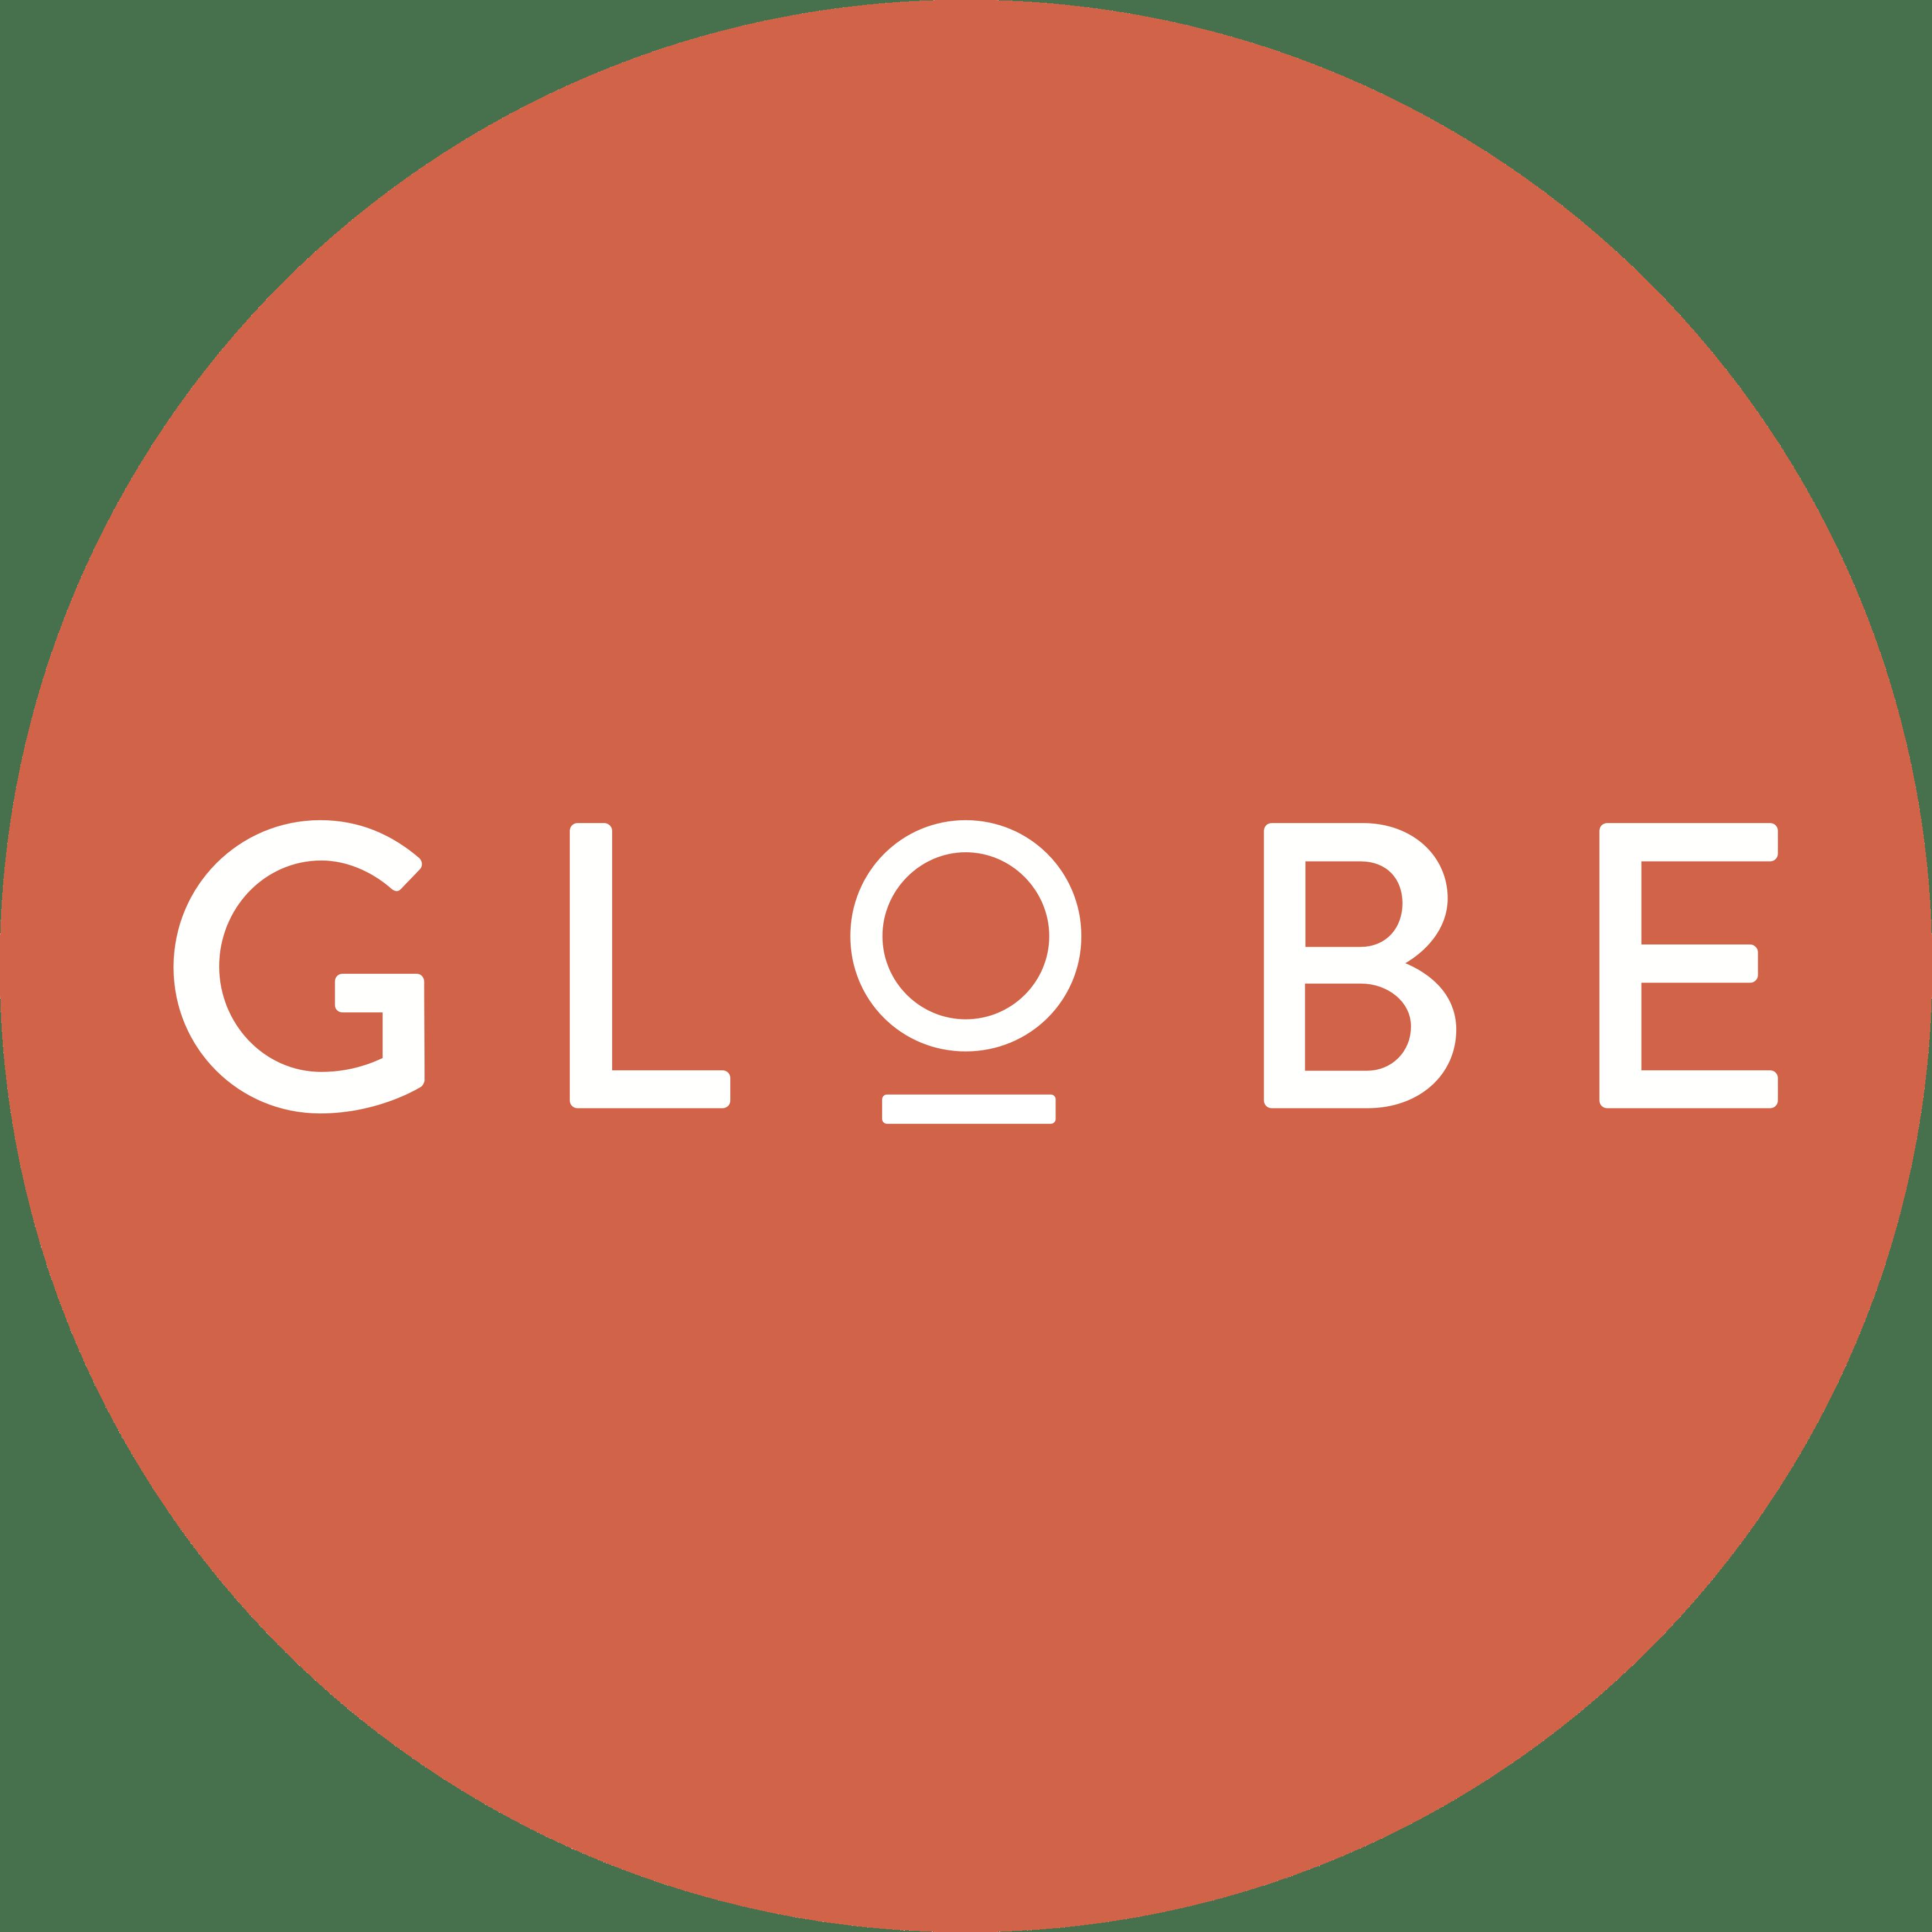 The Globe Church cause logo